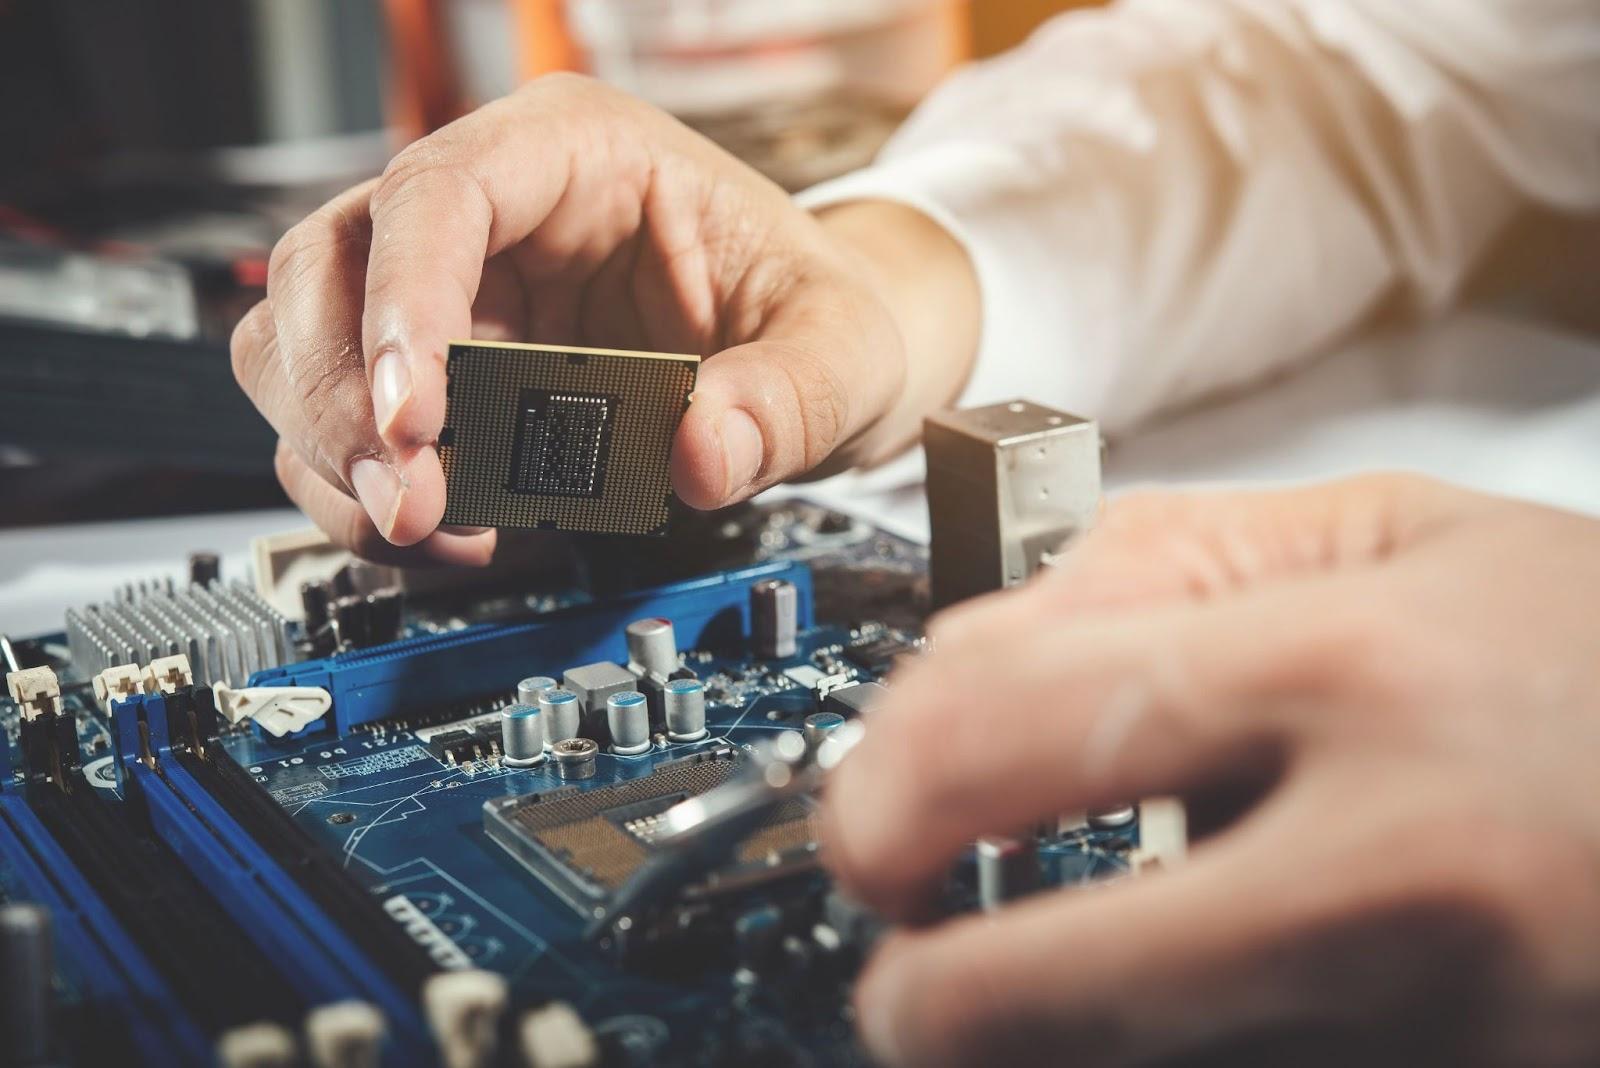 """Computer Repair Jobs Near Me"" - What Do Computer Technicians Do?"